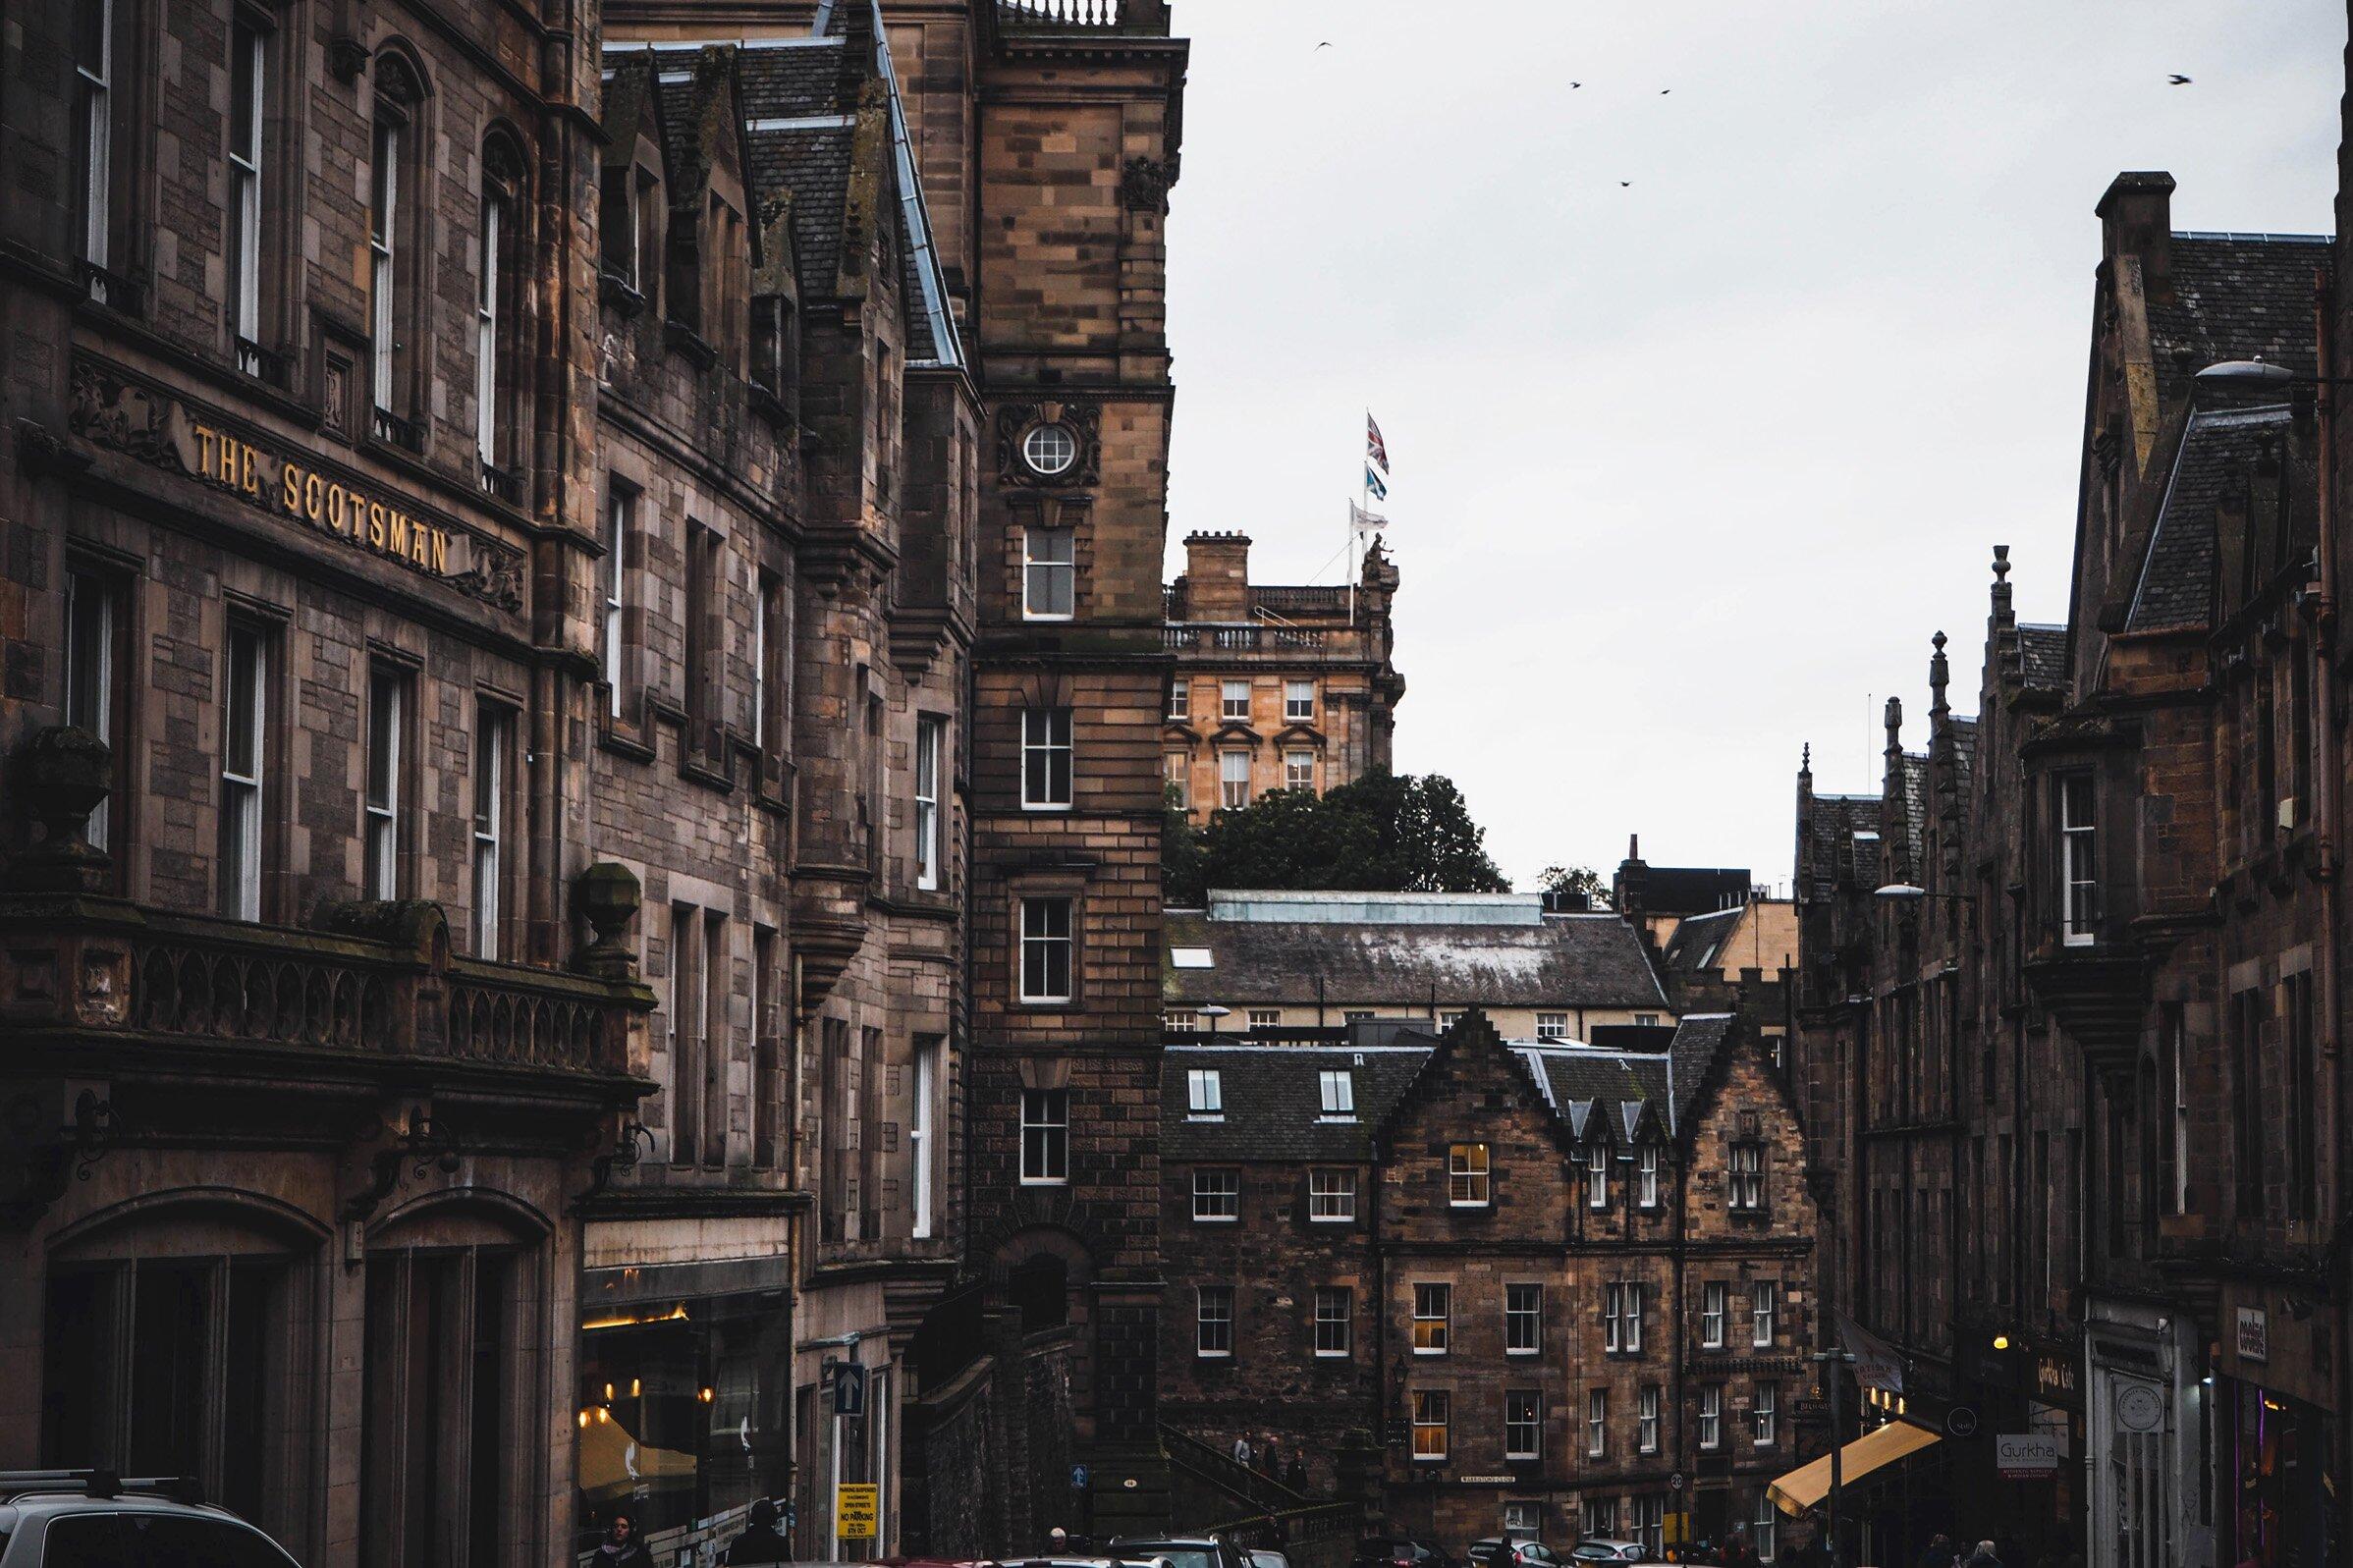 Edinburgh, the cold beauty